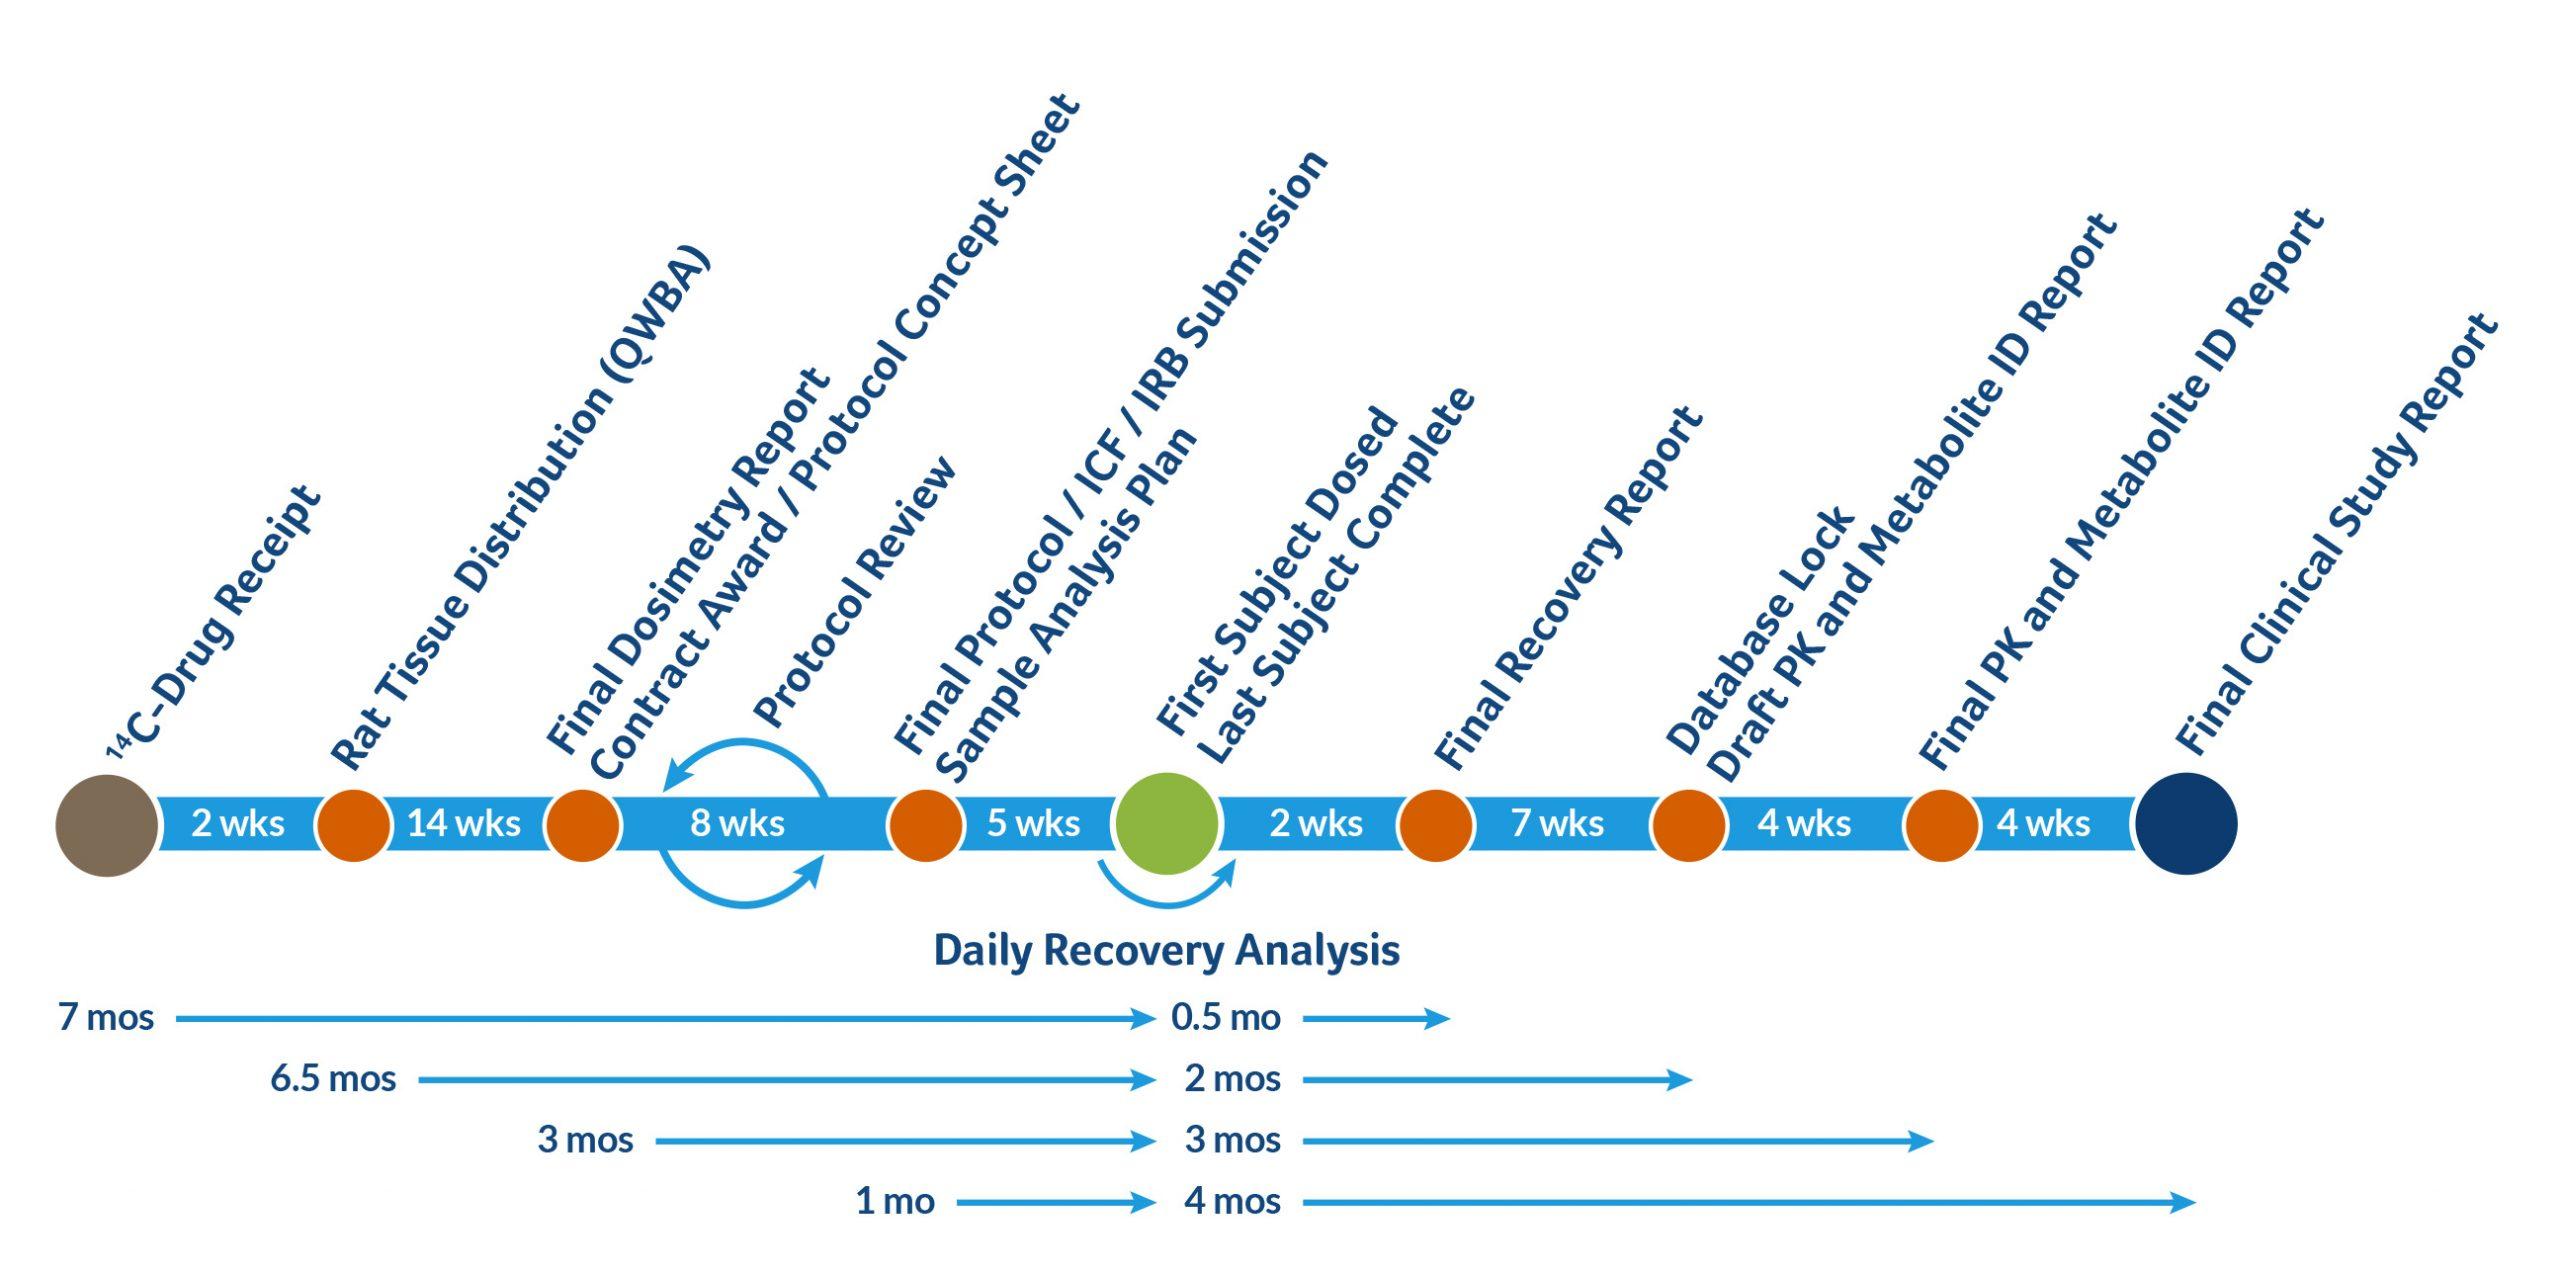 Human hAME Study Timeline 1 scaled - hAME Study Services